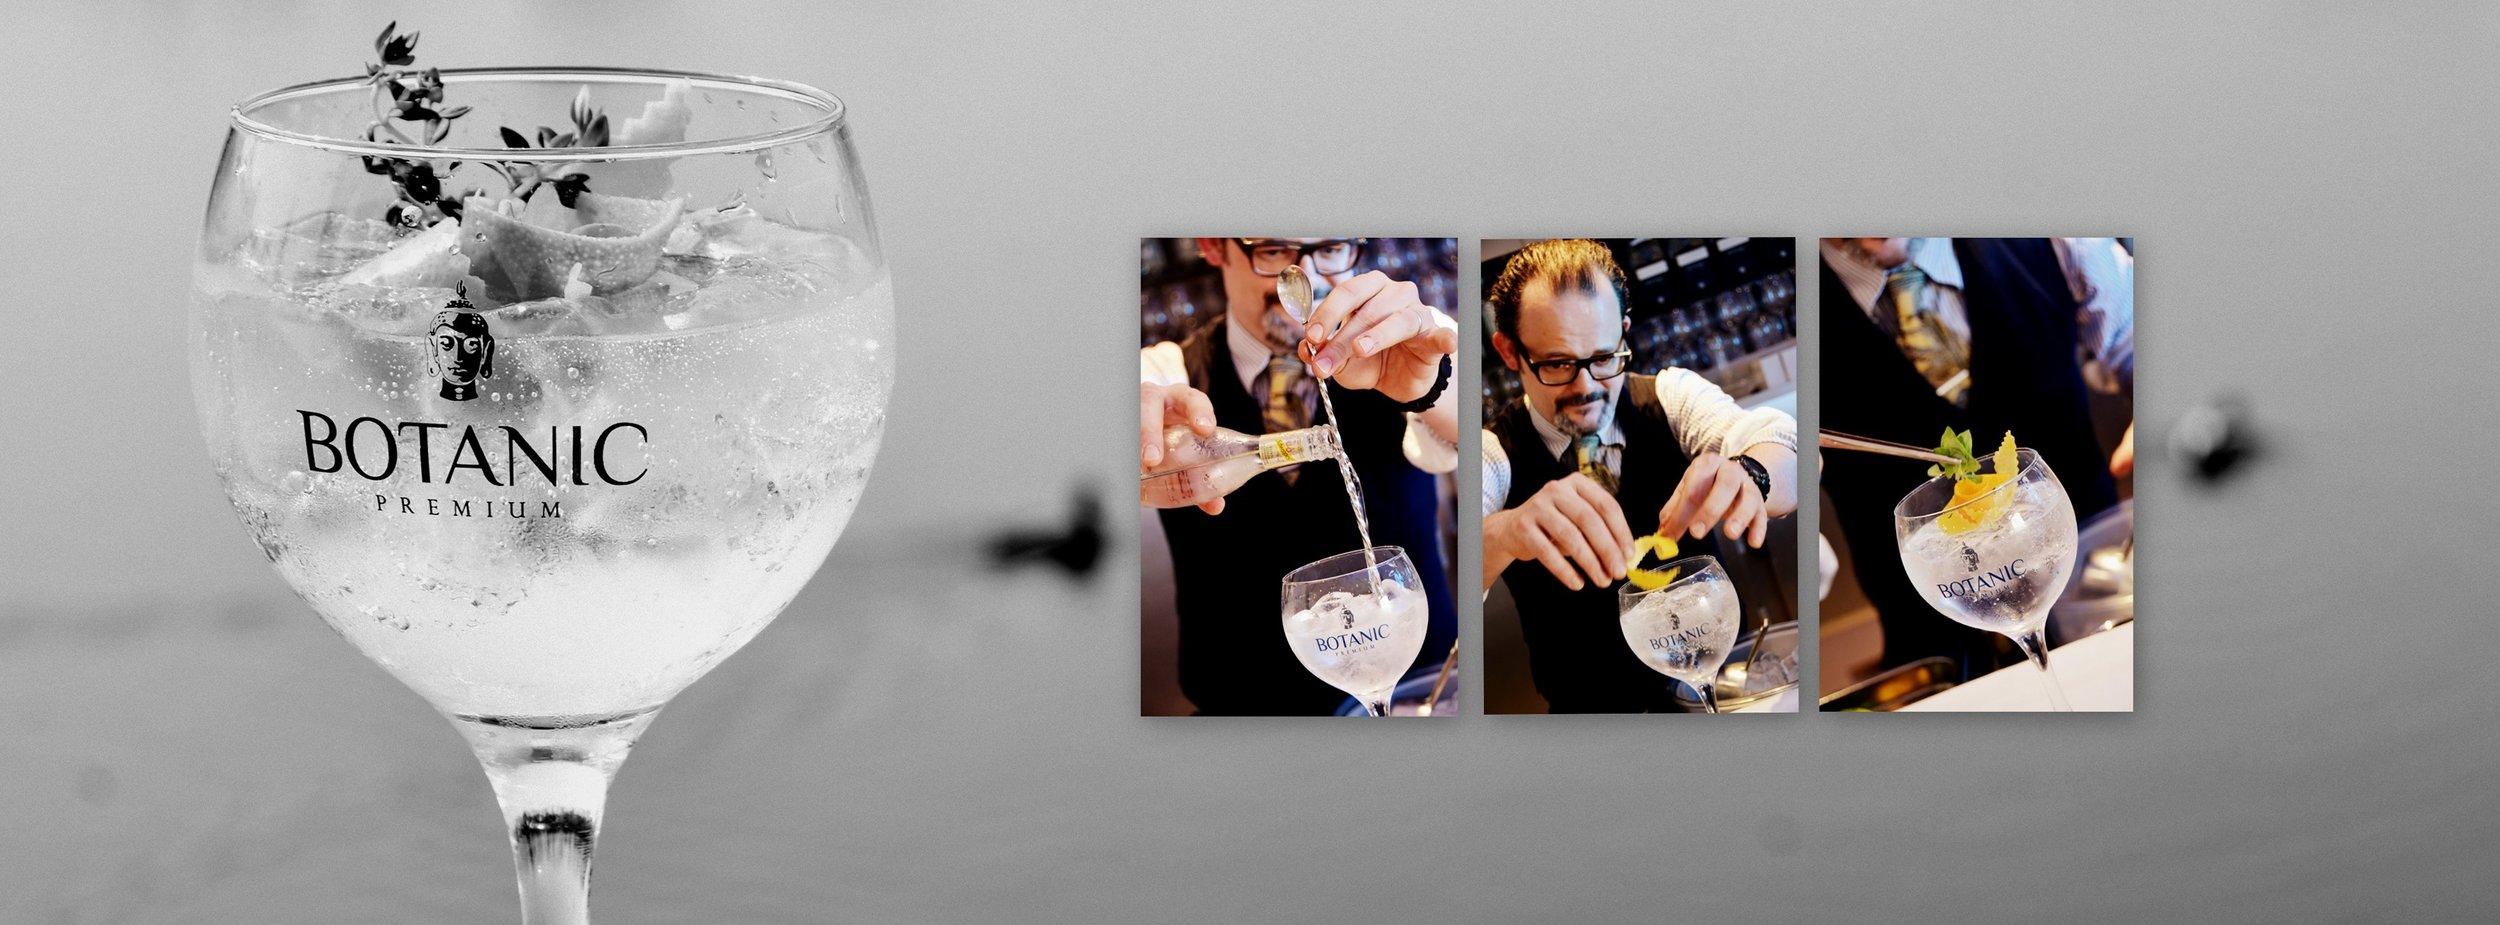 ©2010 El Jefes Cocktails. Original Quality